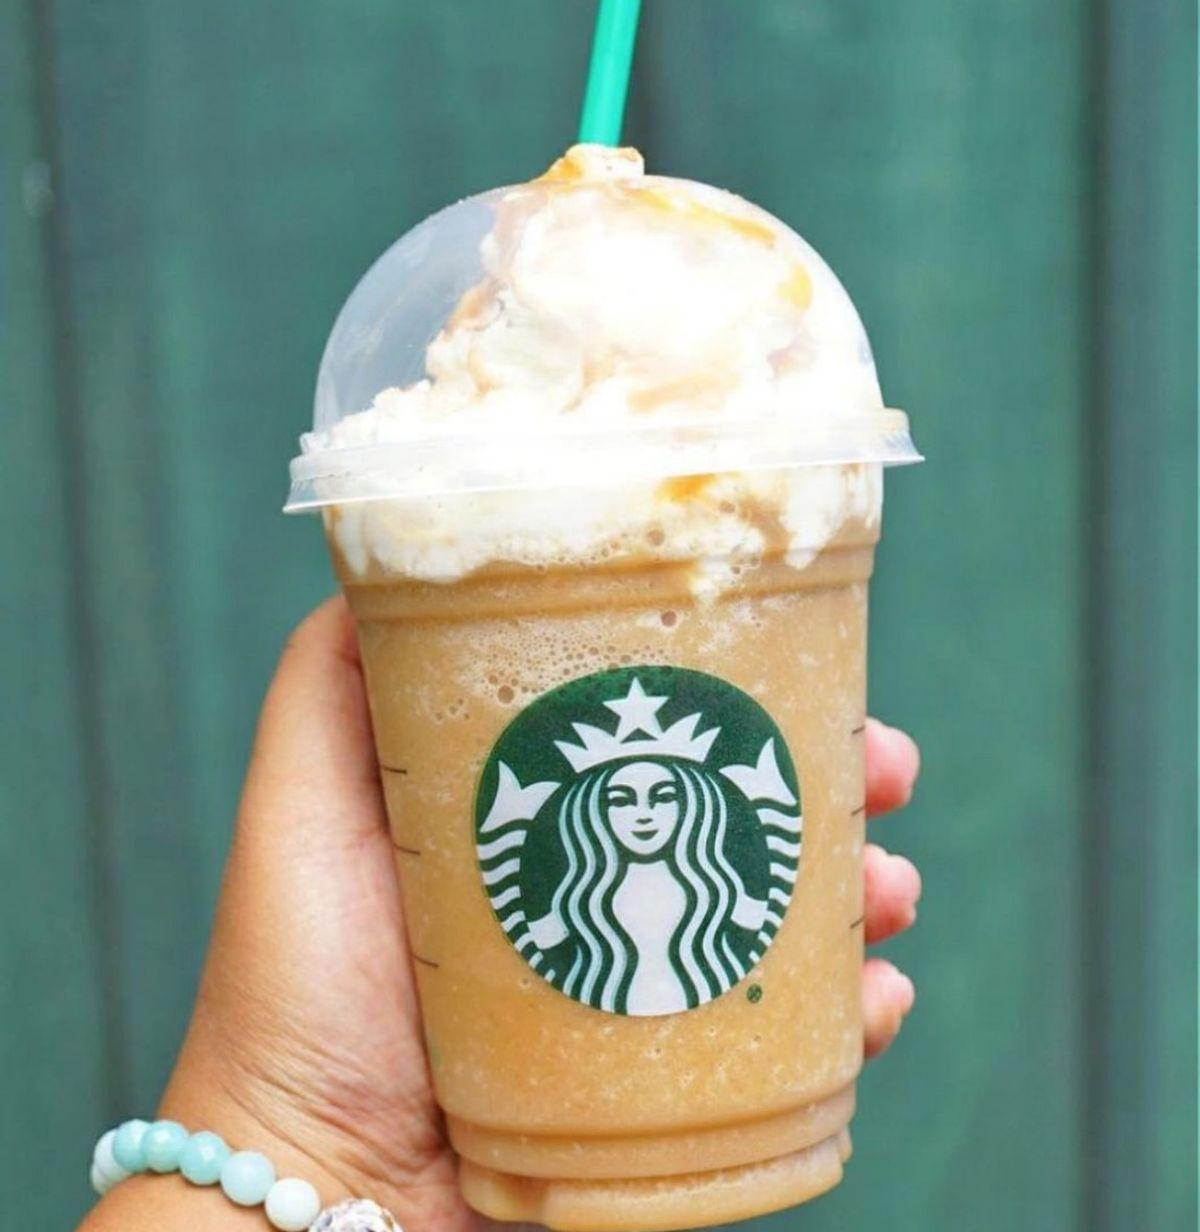 10 Reasons Why Starbucks Baristas Hate Frappuccinos